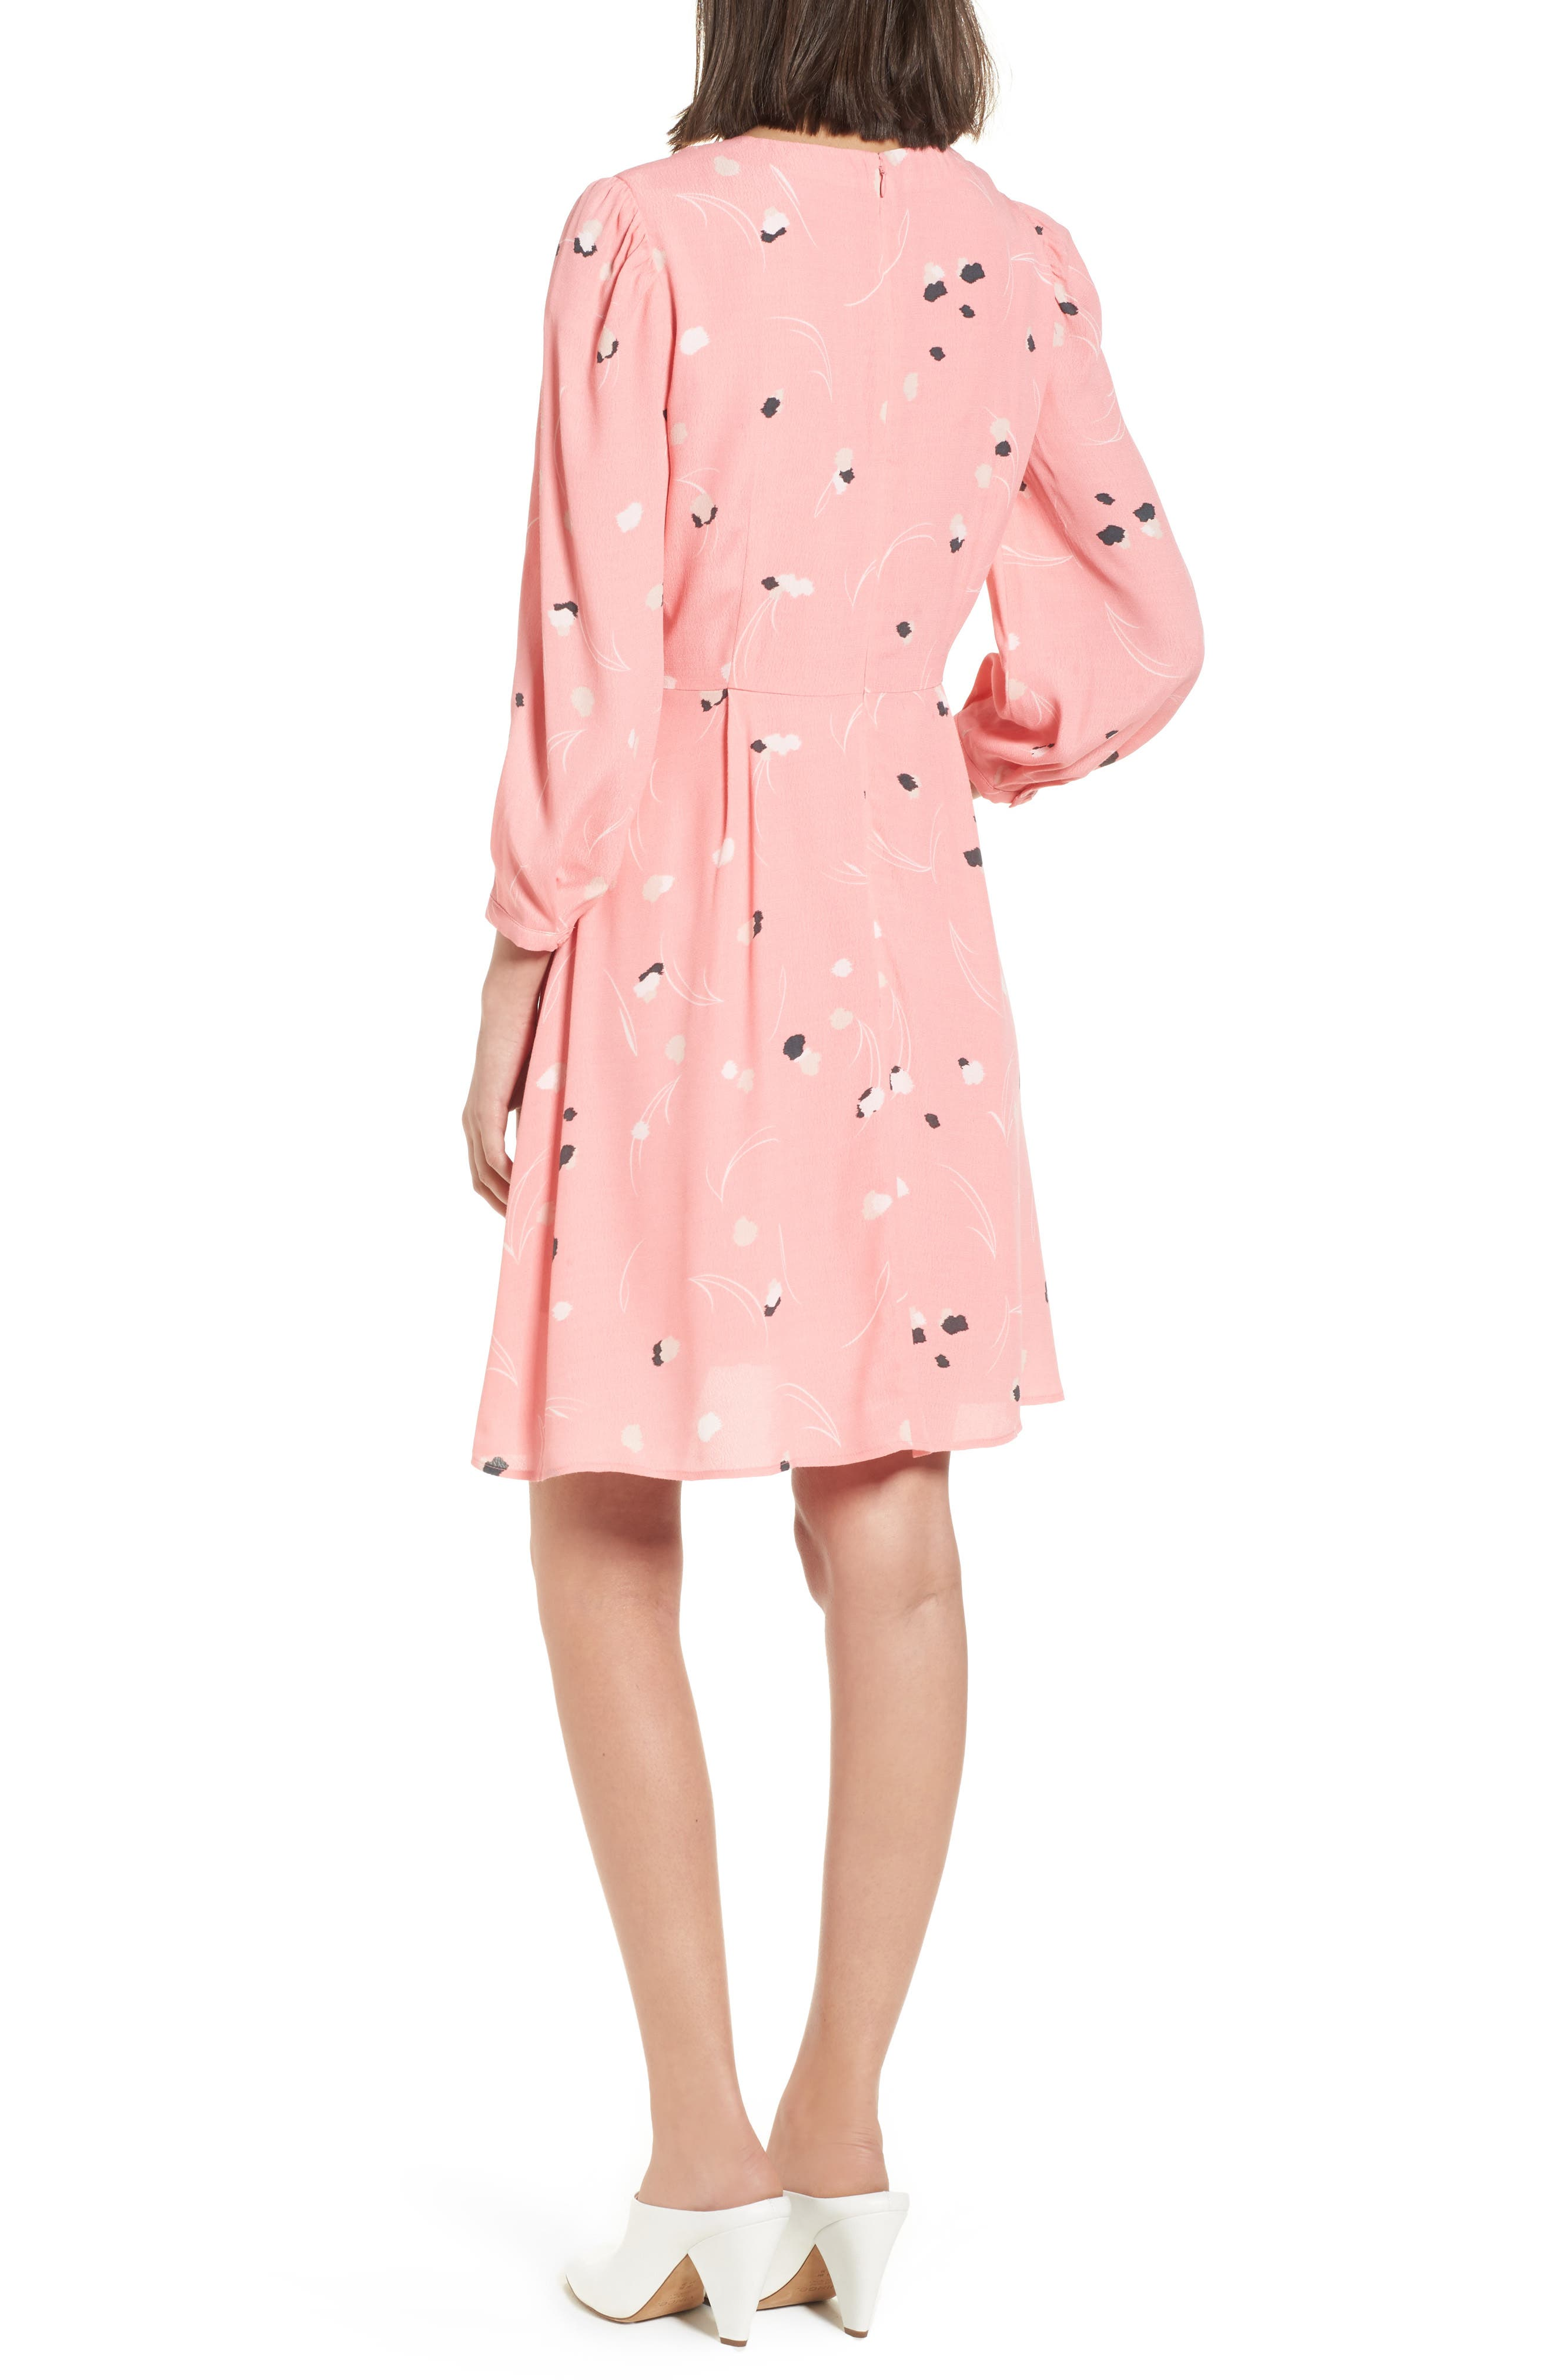 V-Neck Puff Sleeve Dress,                             Alternate thumbnail 2, color,                             Pink Flamingo Mini Pops